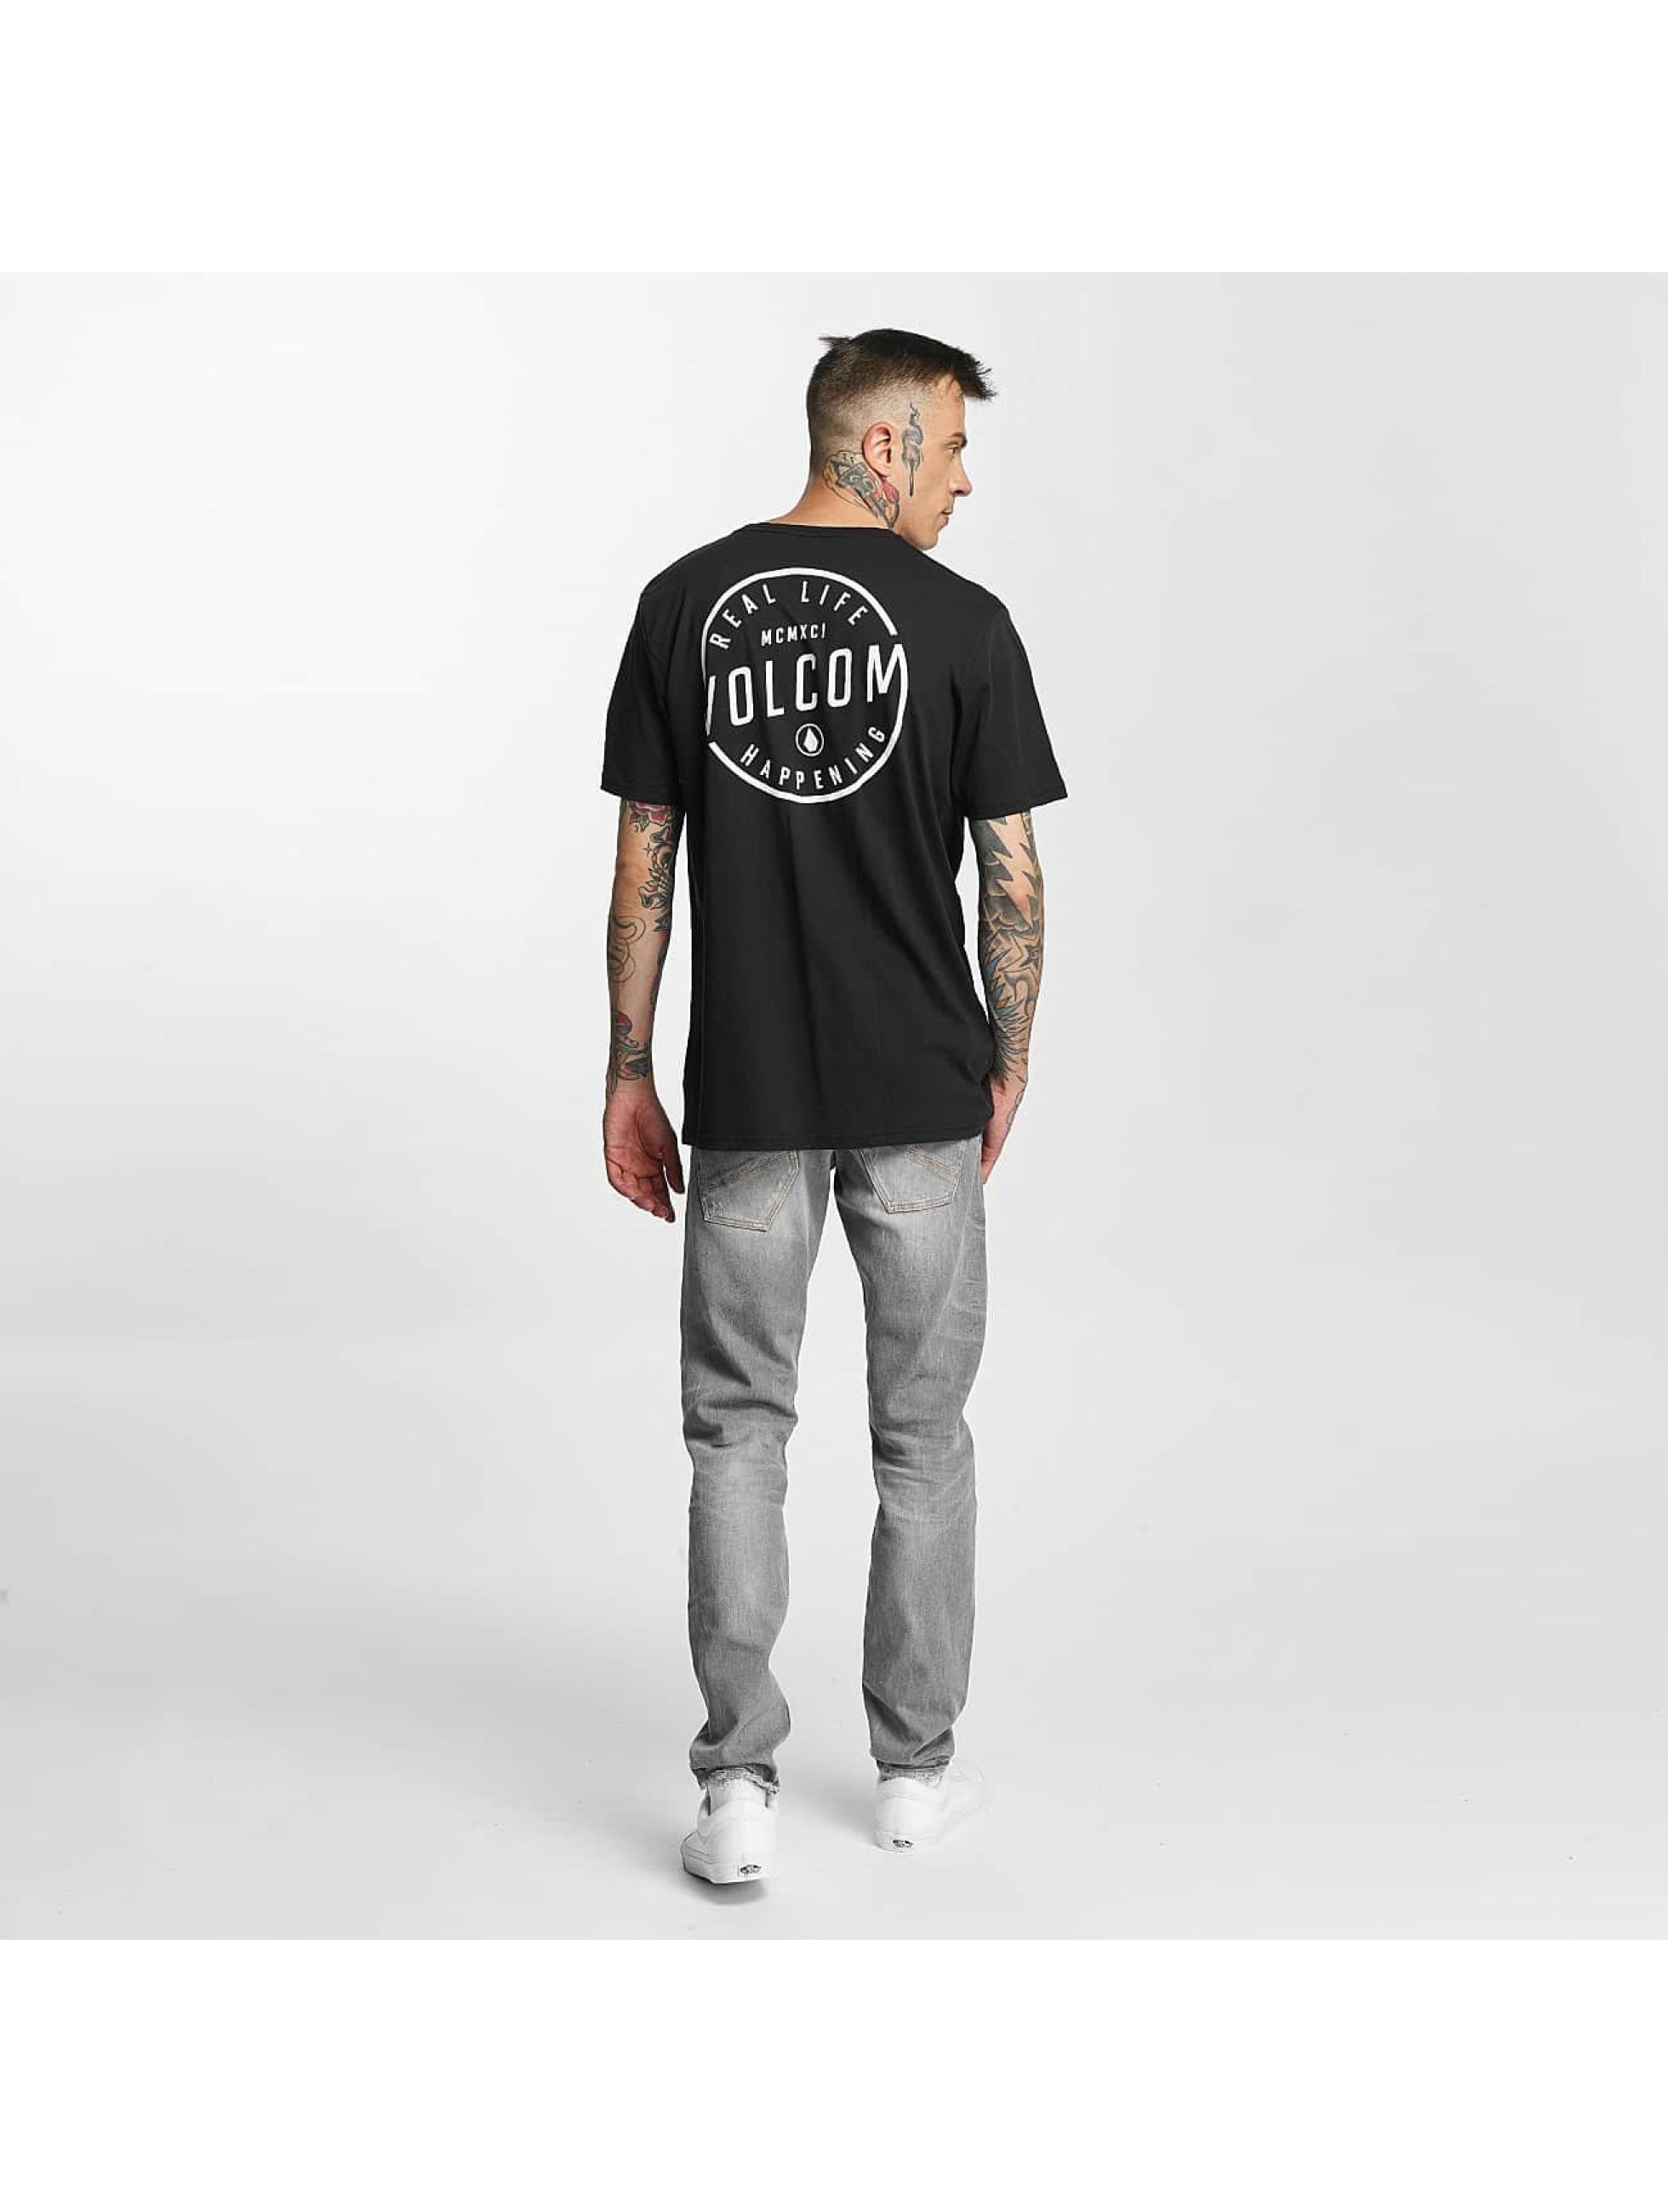 Volcom T-Shirt On Look Basic schwarz